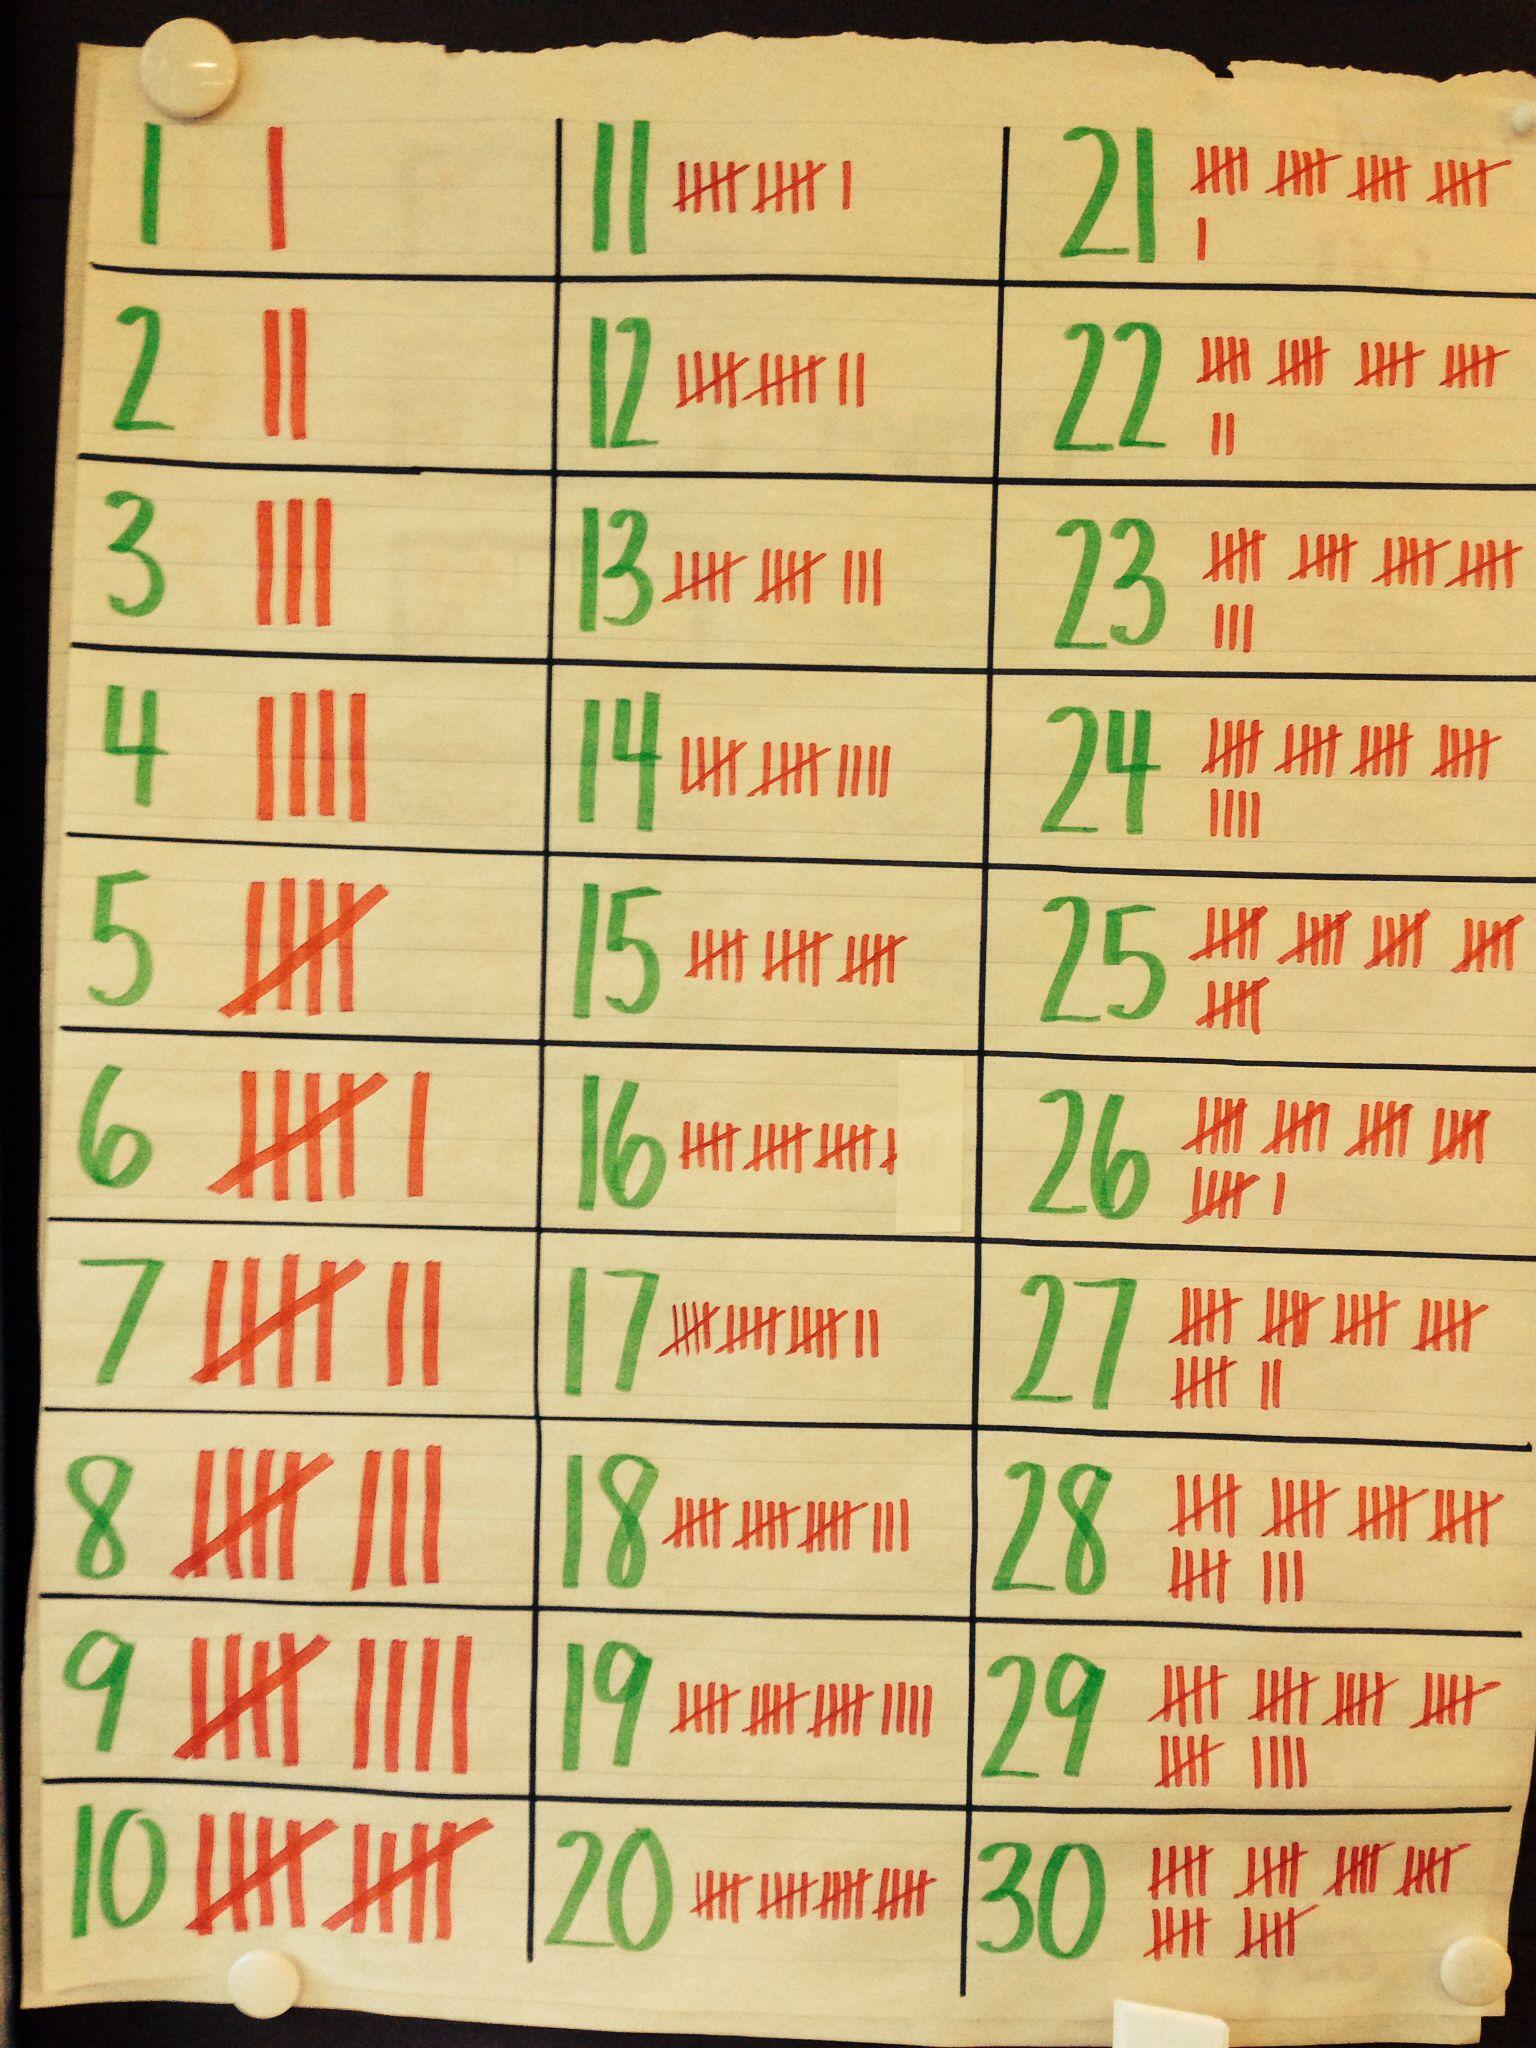 Tally Mark Anchor Chart My Kiddos Definitely Liked To See